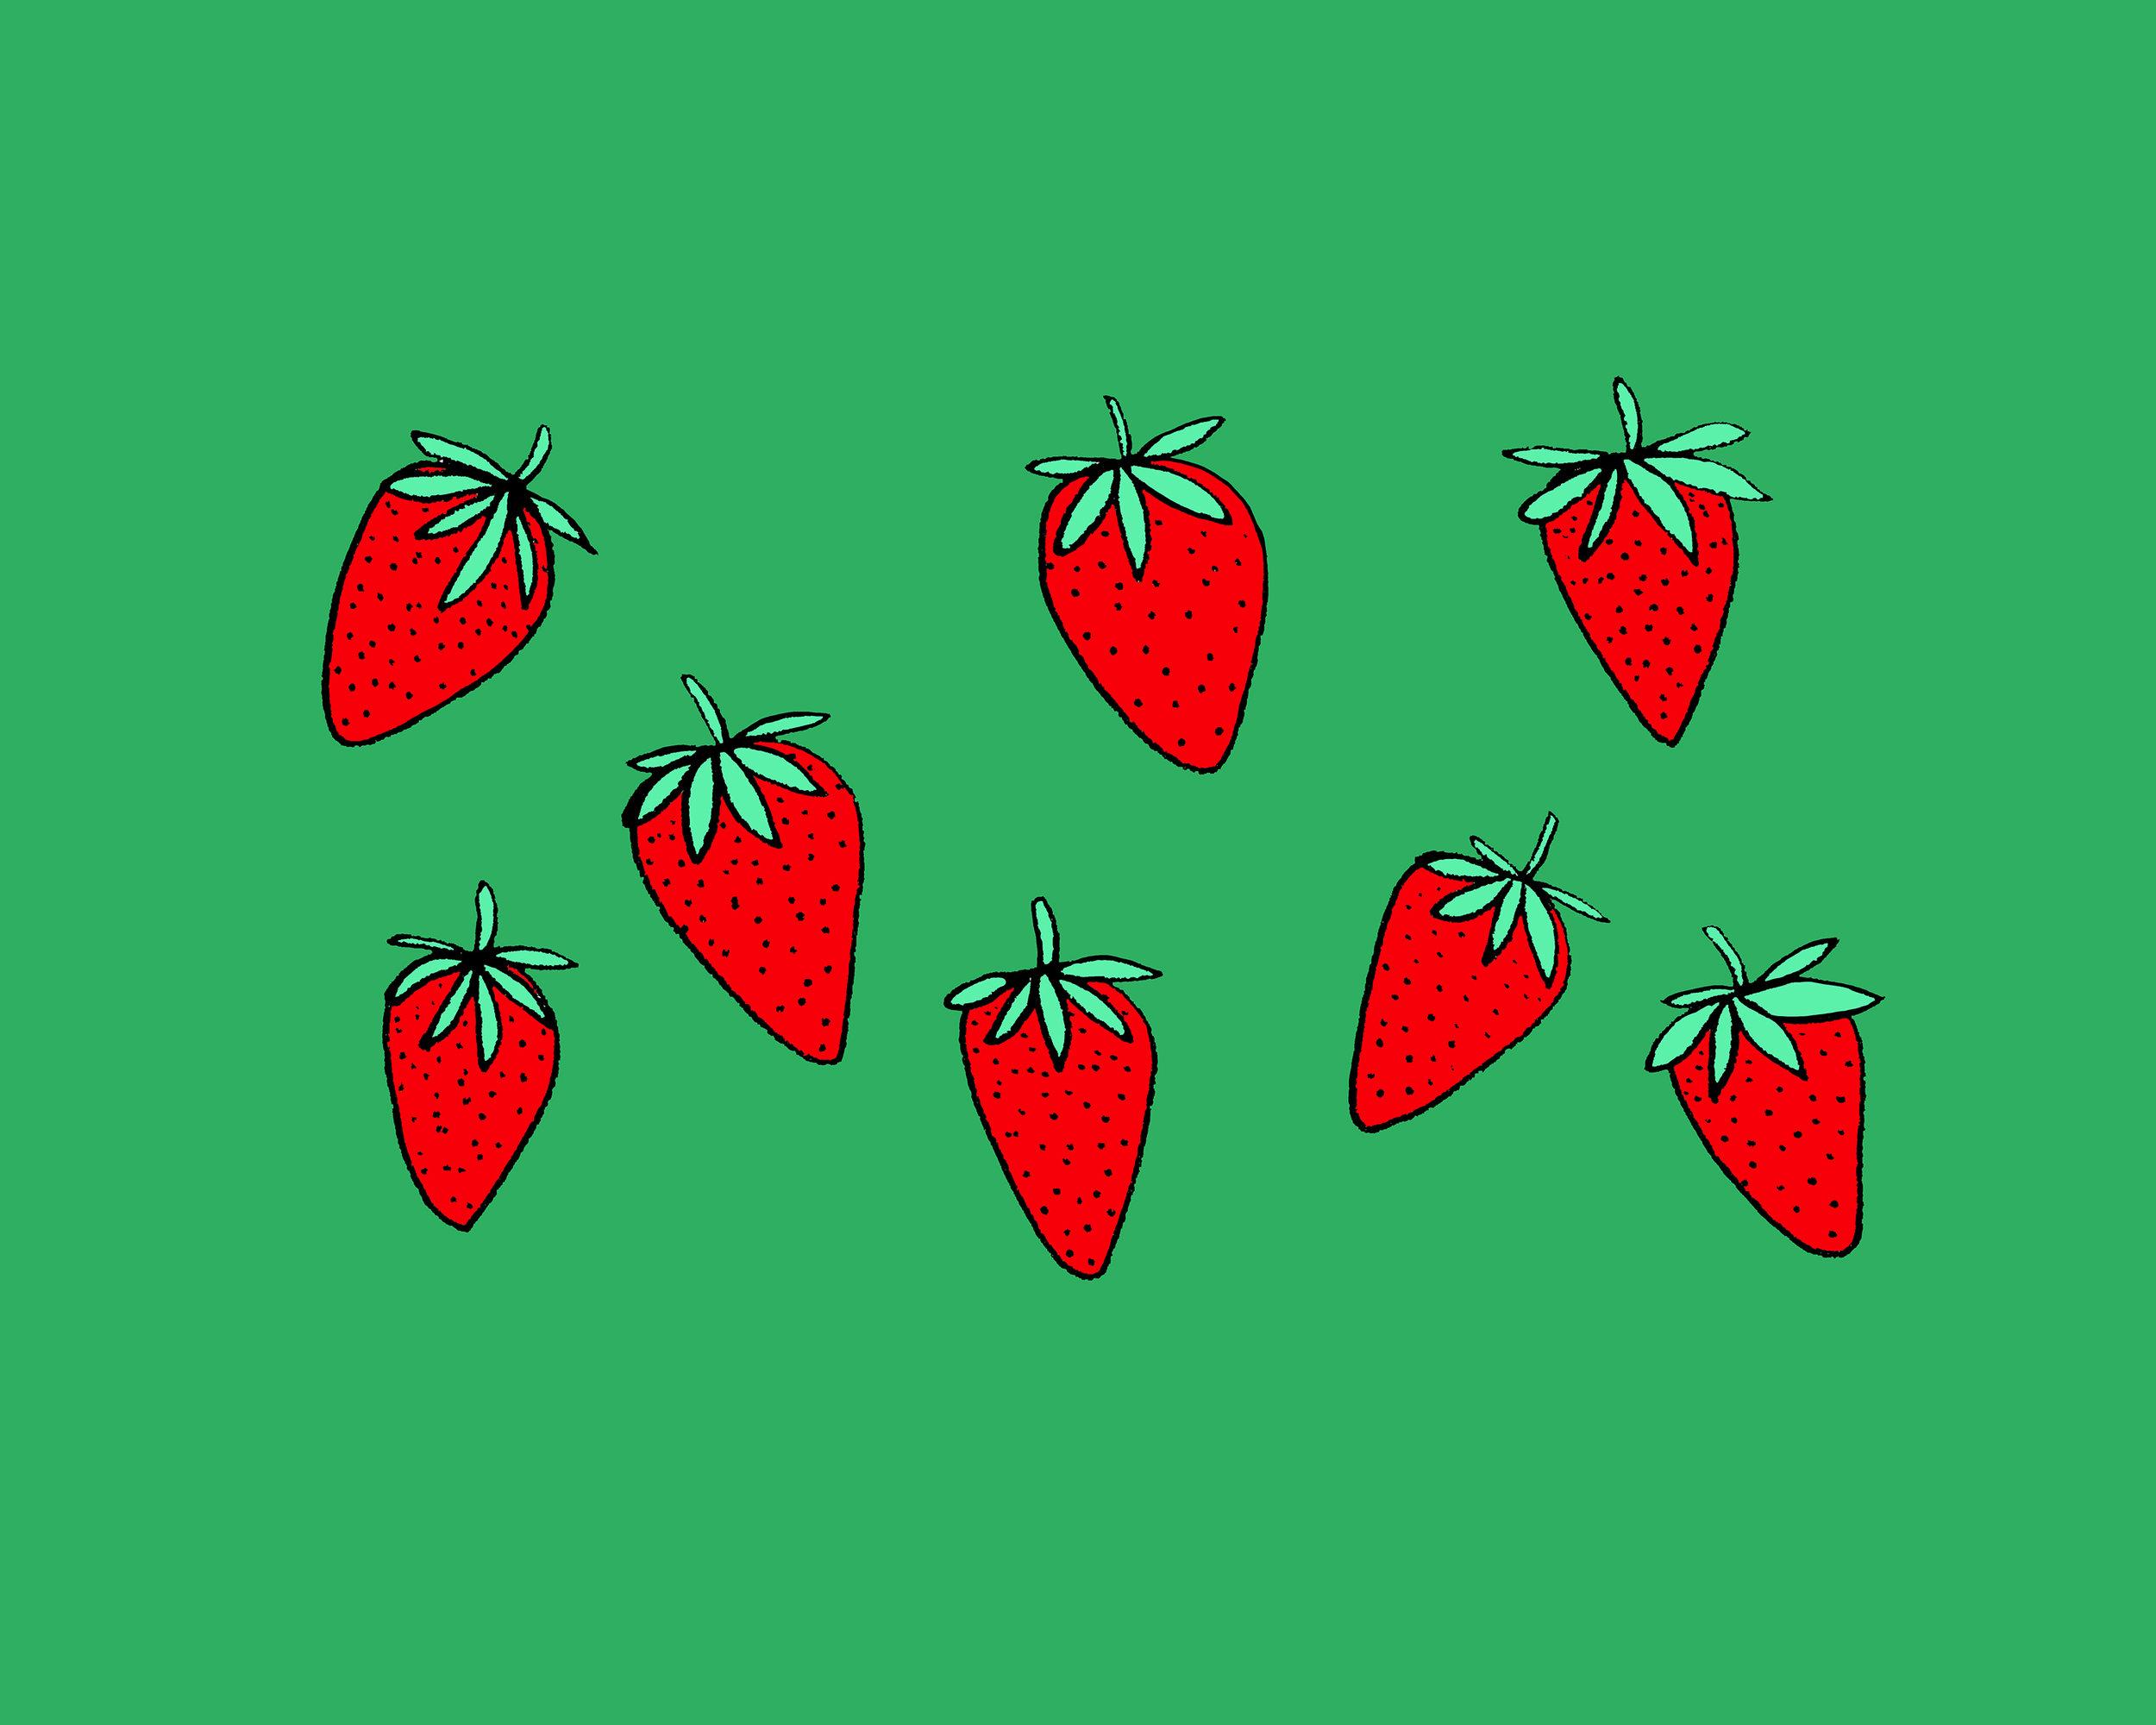 Strawberries Illustration by Emma Freeman Designs